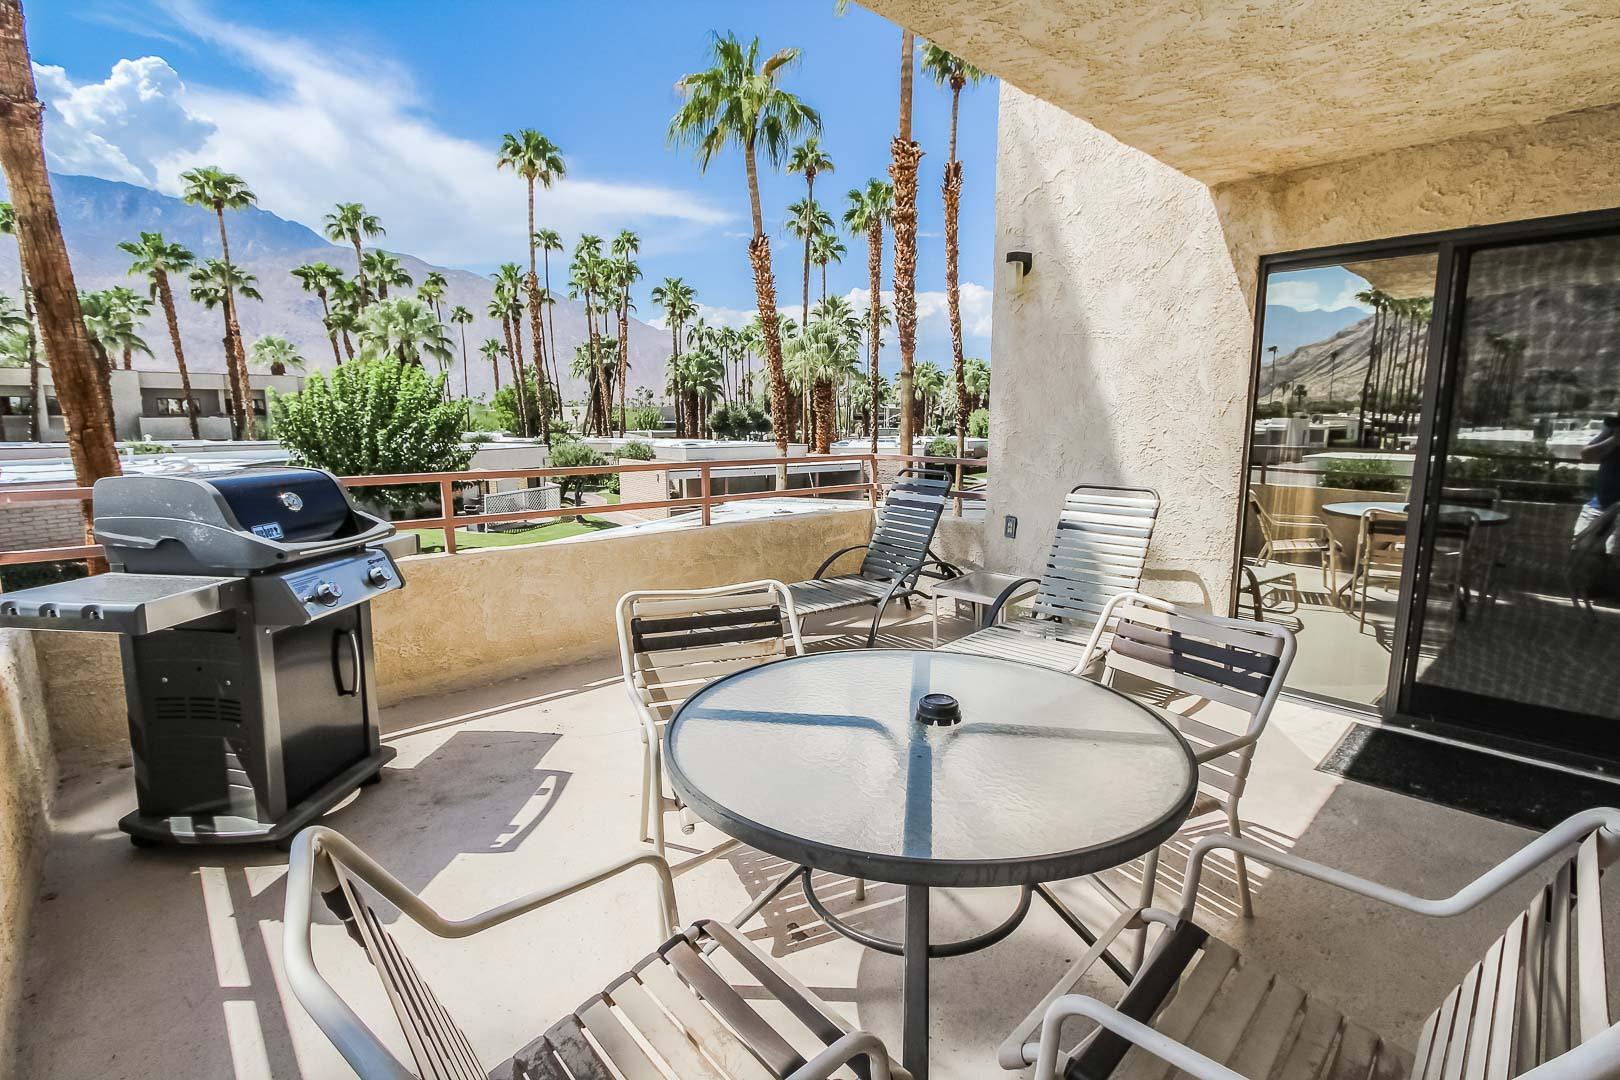 A relaxing balcony view at VRI's Desert Isle Resort in California.